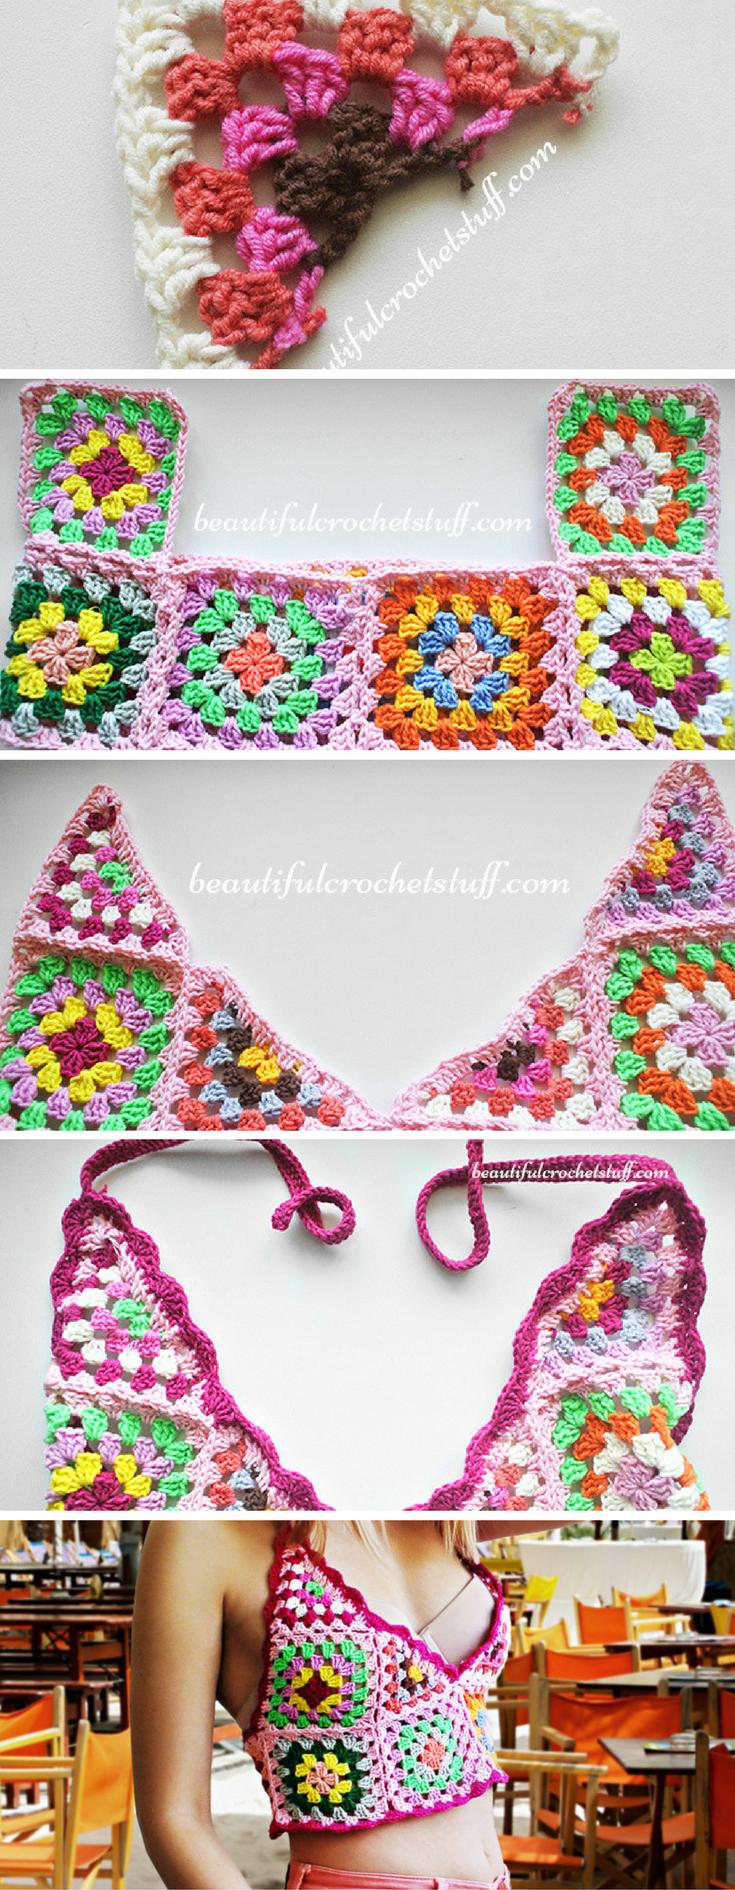 Crochet Crop Top Pattern | Check | Pinterest | Tejido, Blusas y ...